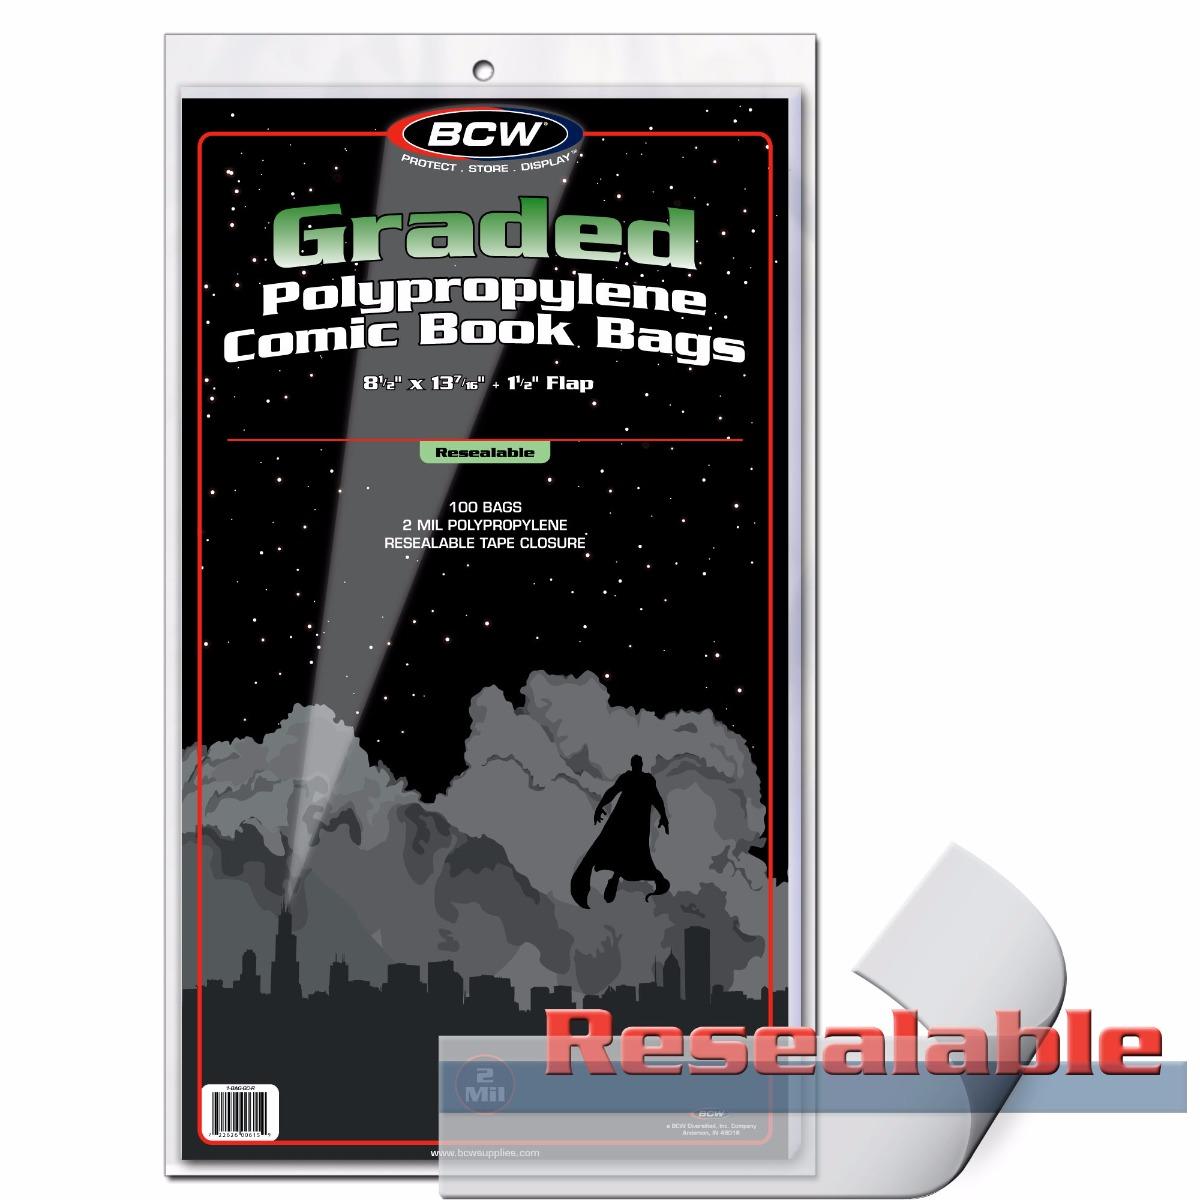 BCW GRADED COMIC BAG - RESEALABLE - 9 X 14 - 1-BAG-GC1-R - Pack of 100